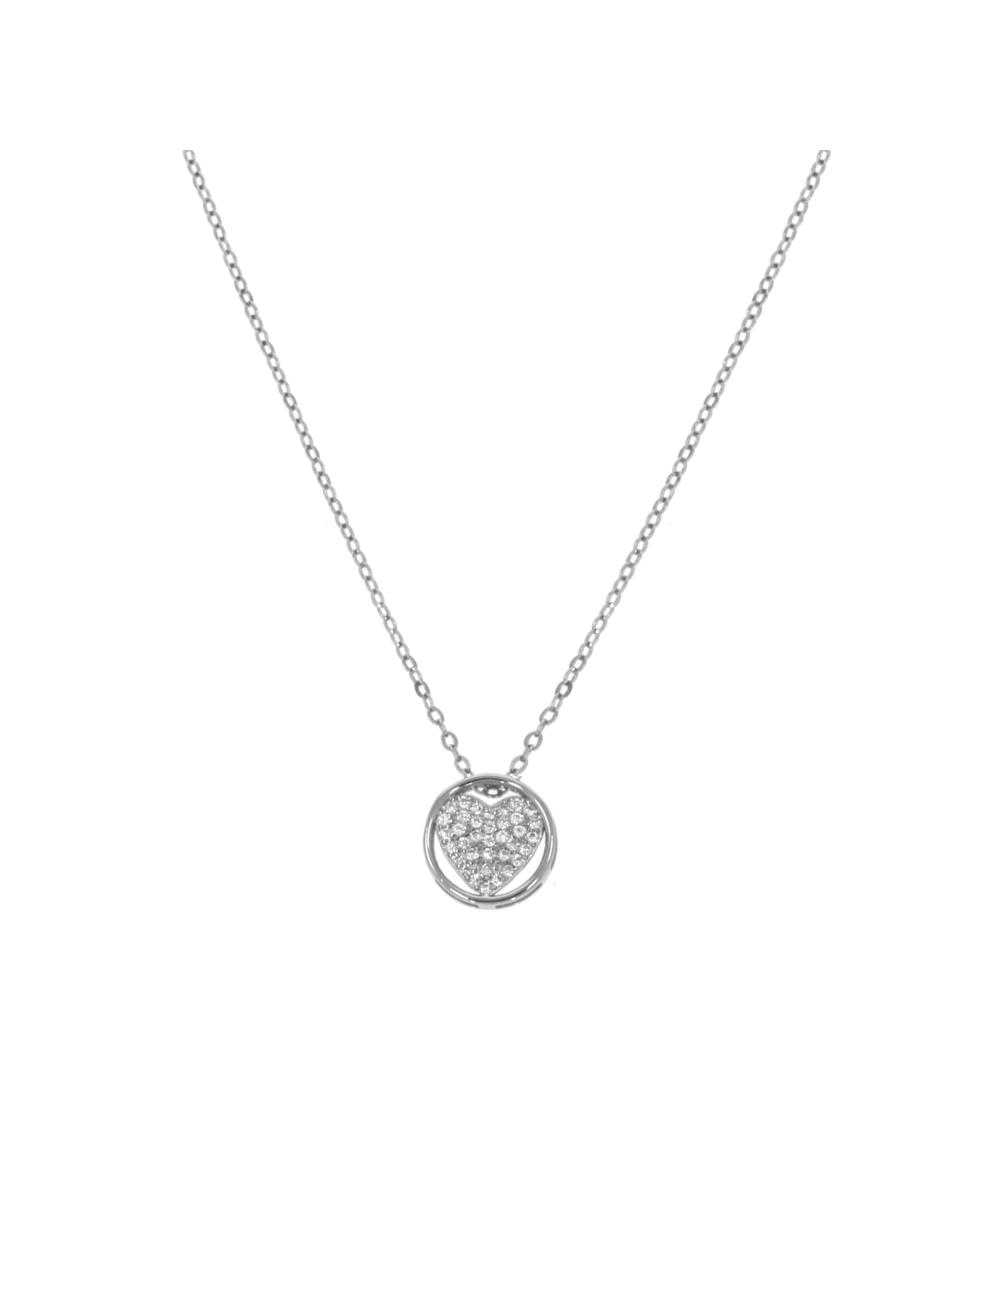 10013039 Naszyjnik srebrny pr.925 z cyrkoniami